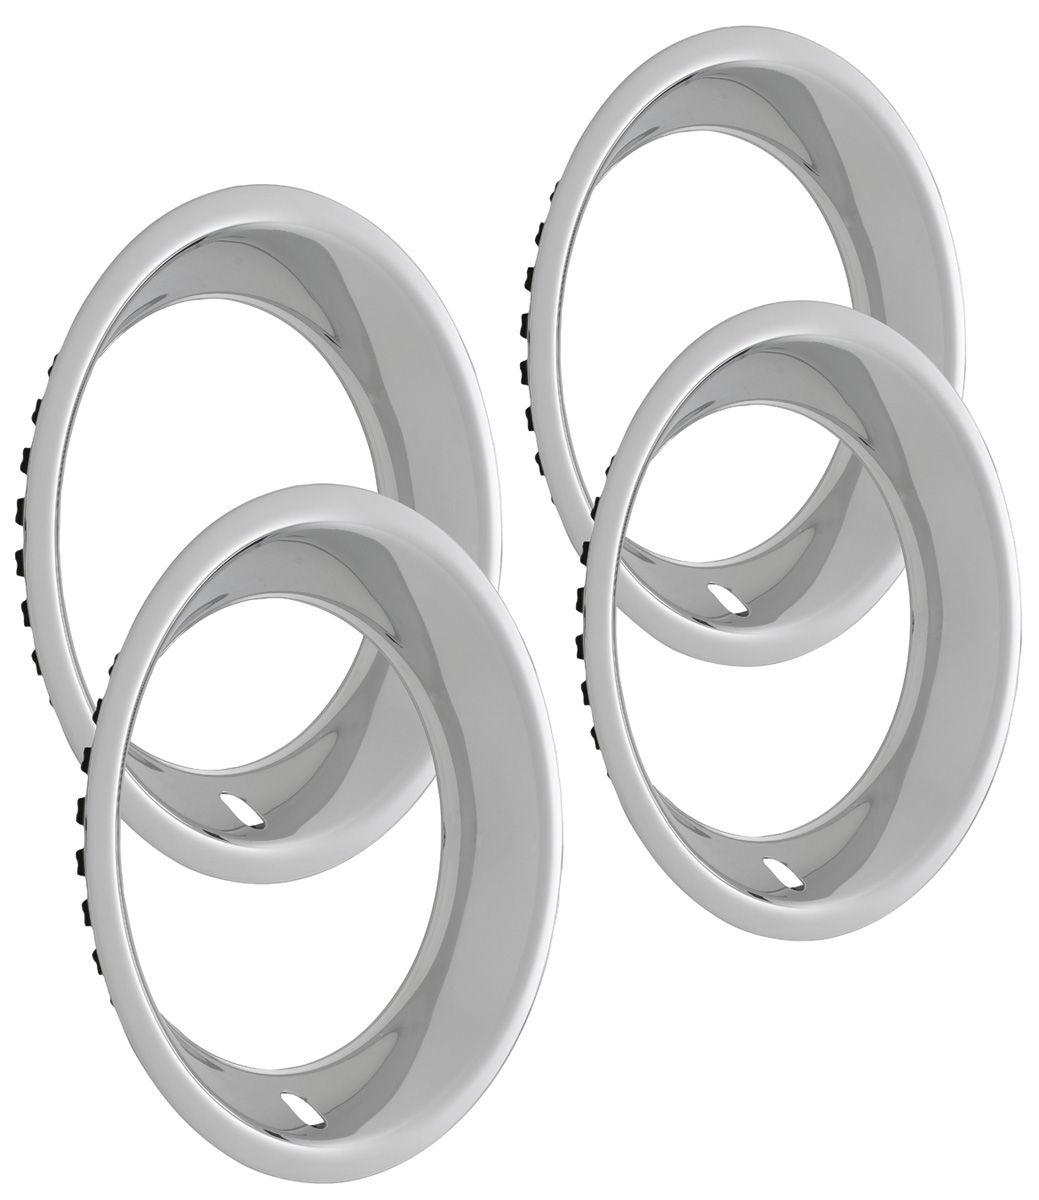 "Photo of Regal Wheel Trim Rings, Rally (Stainless) Round Lip 15"" x 7"" (2-3/8"" deep)"